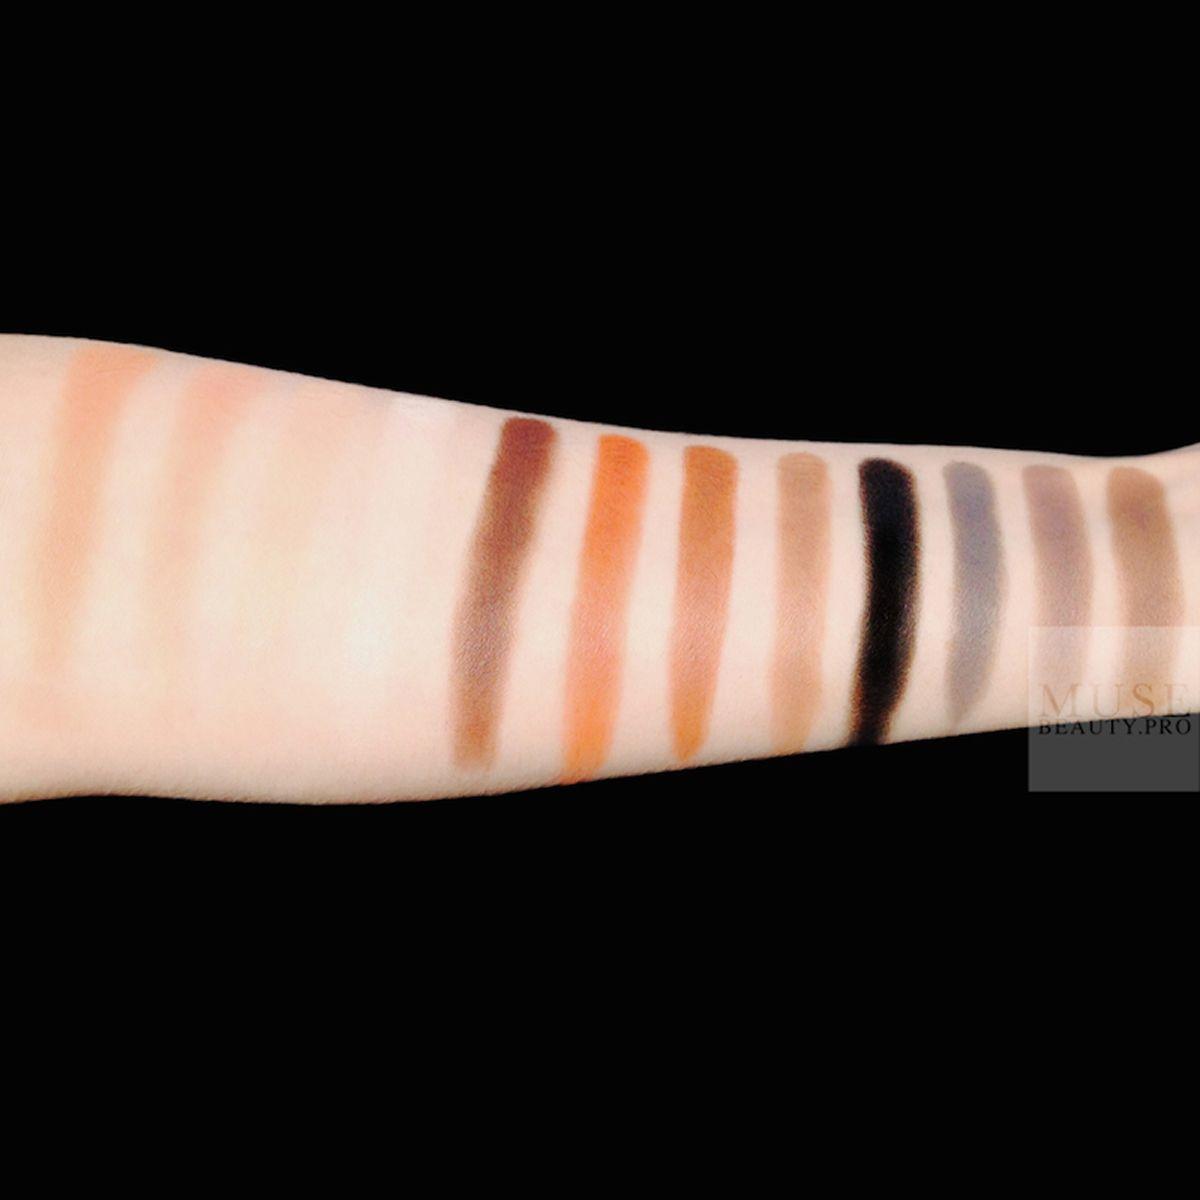 Lip Palette - Muse Nudes by Viseart #22